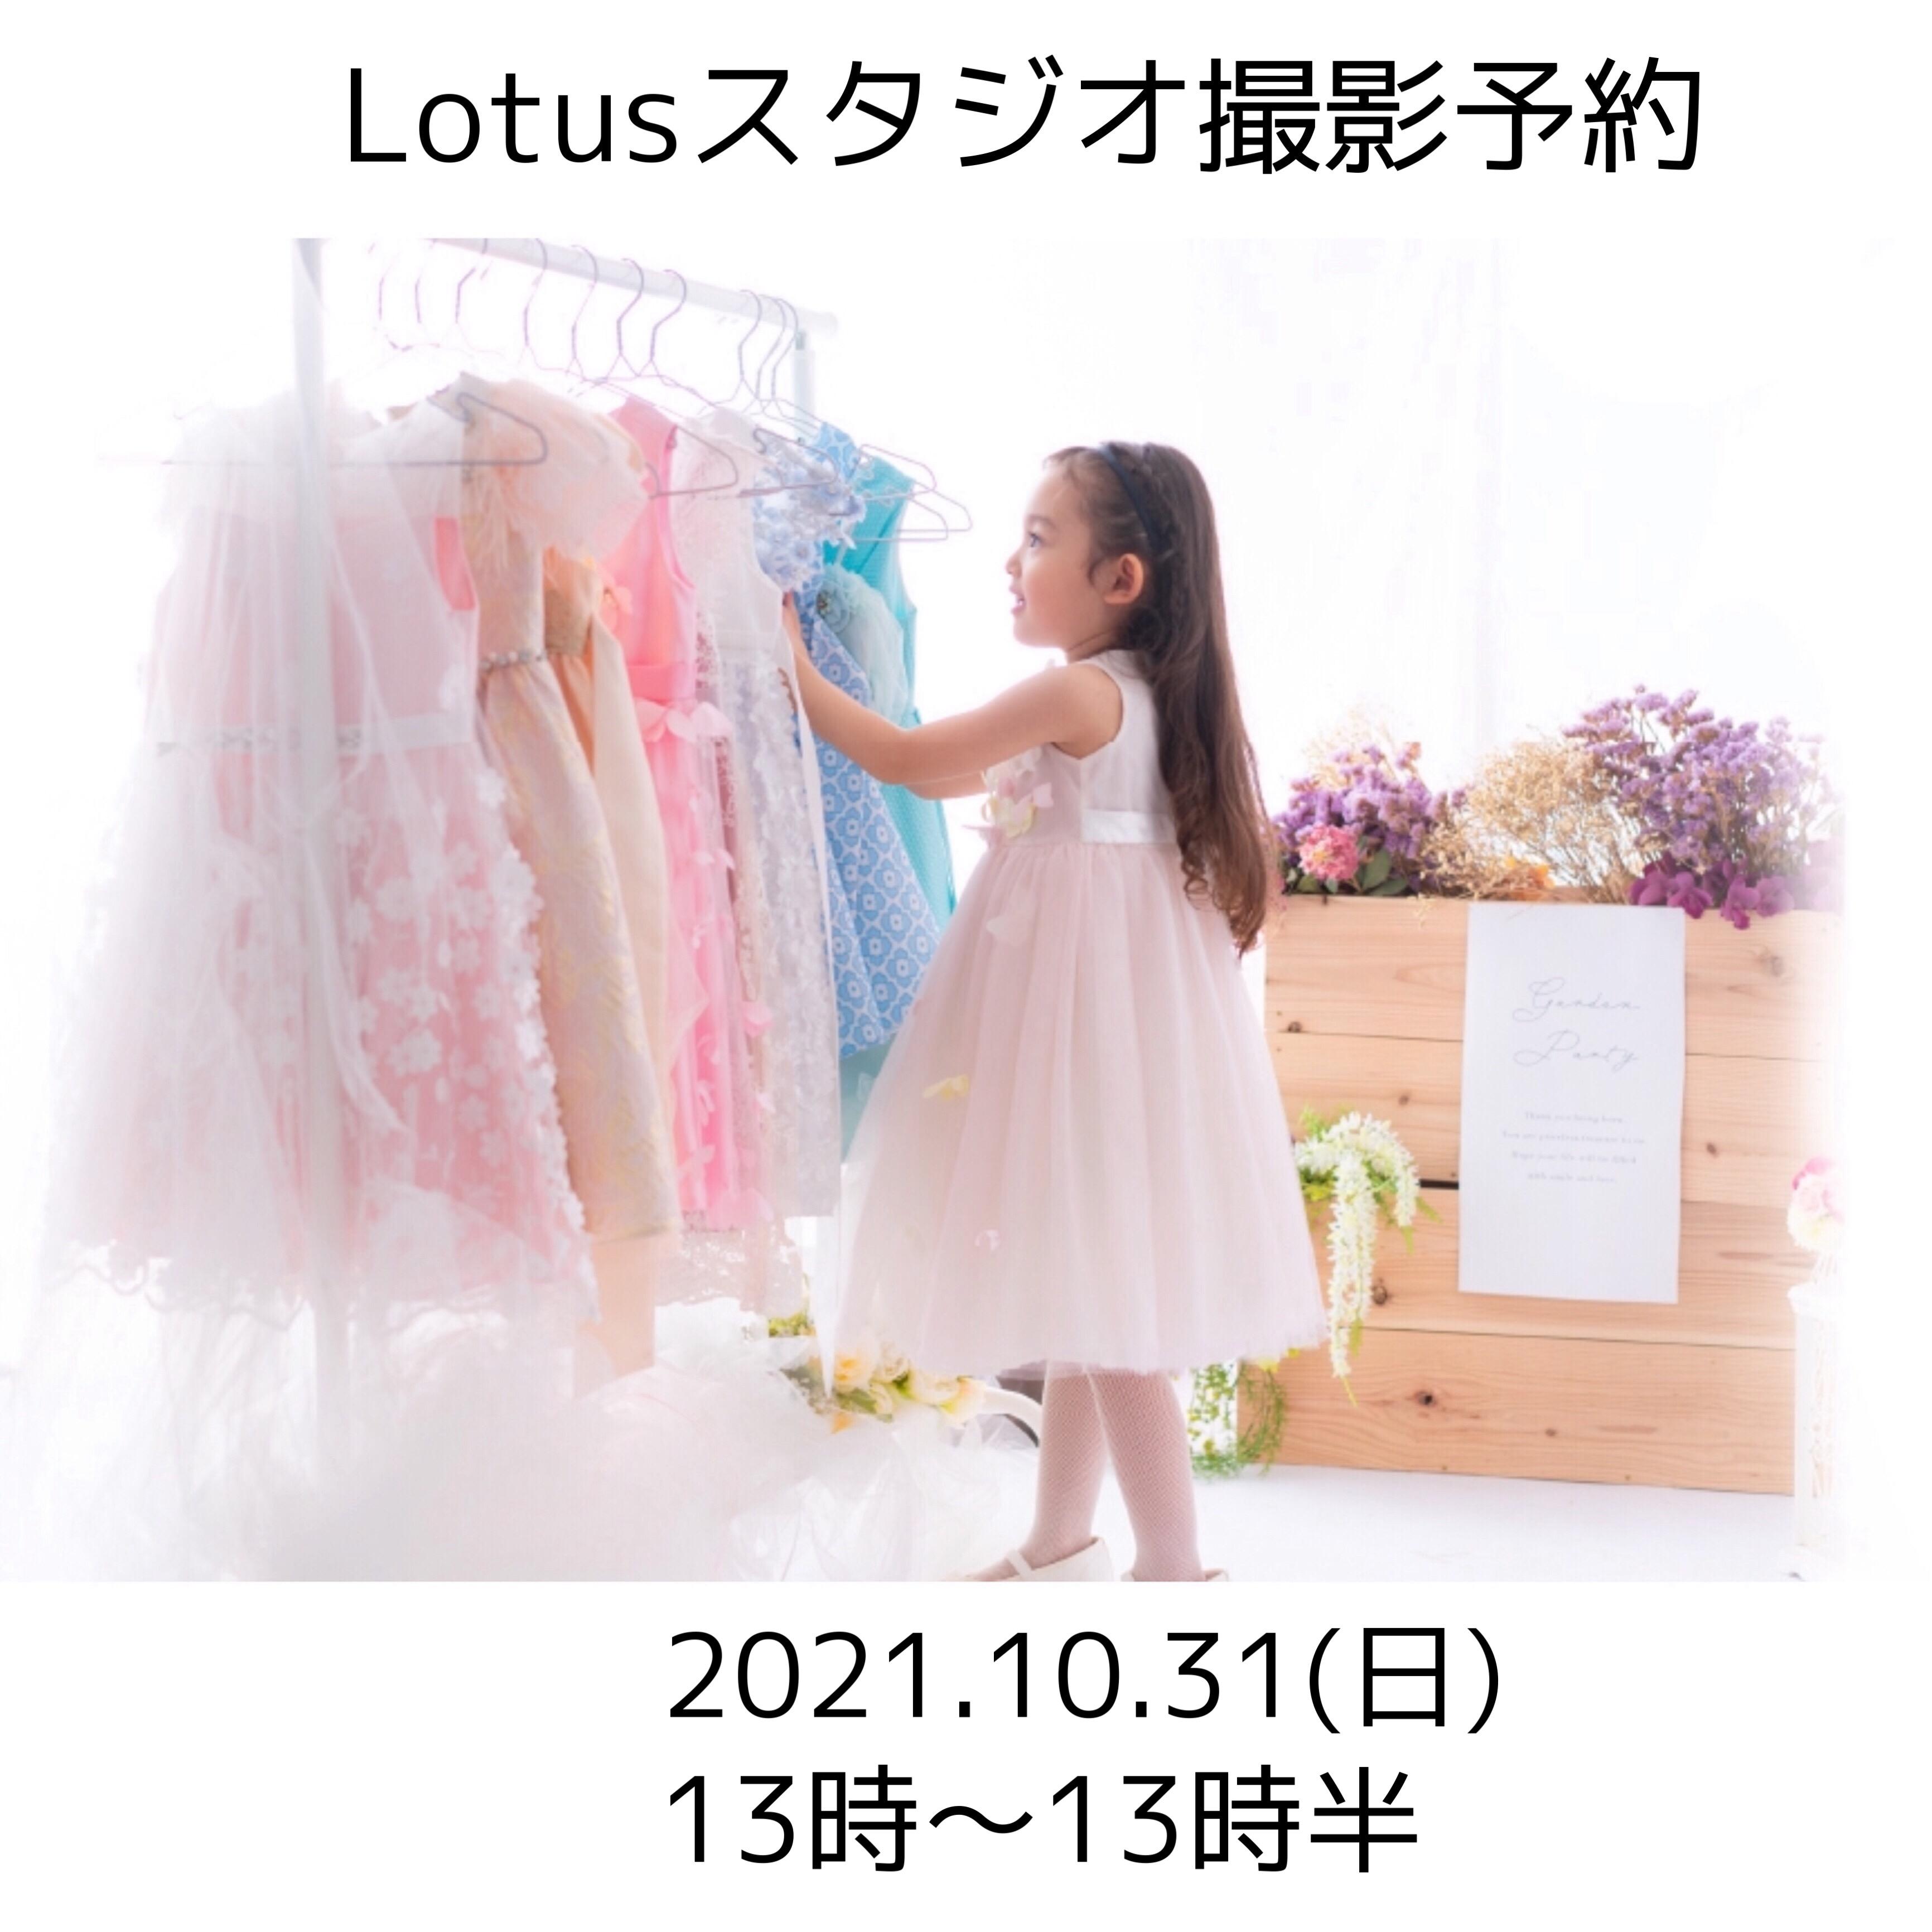 SOLDOUTキャンペーン価格:スタジオLotus/GardenParty撮影プラン2021.10.31(日)13時~13時半